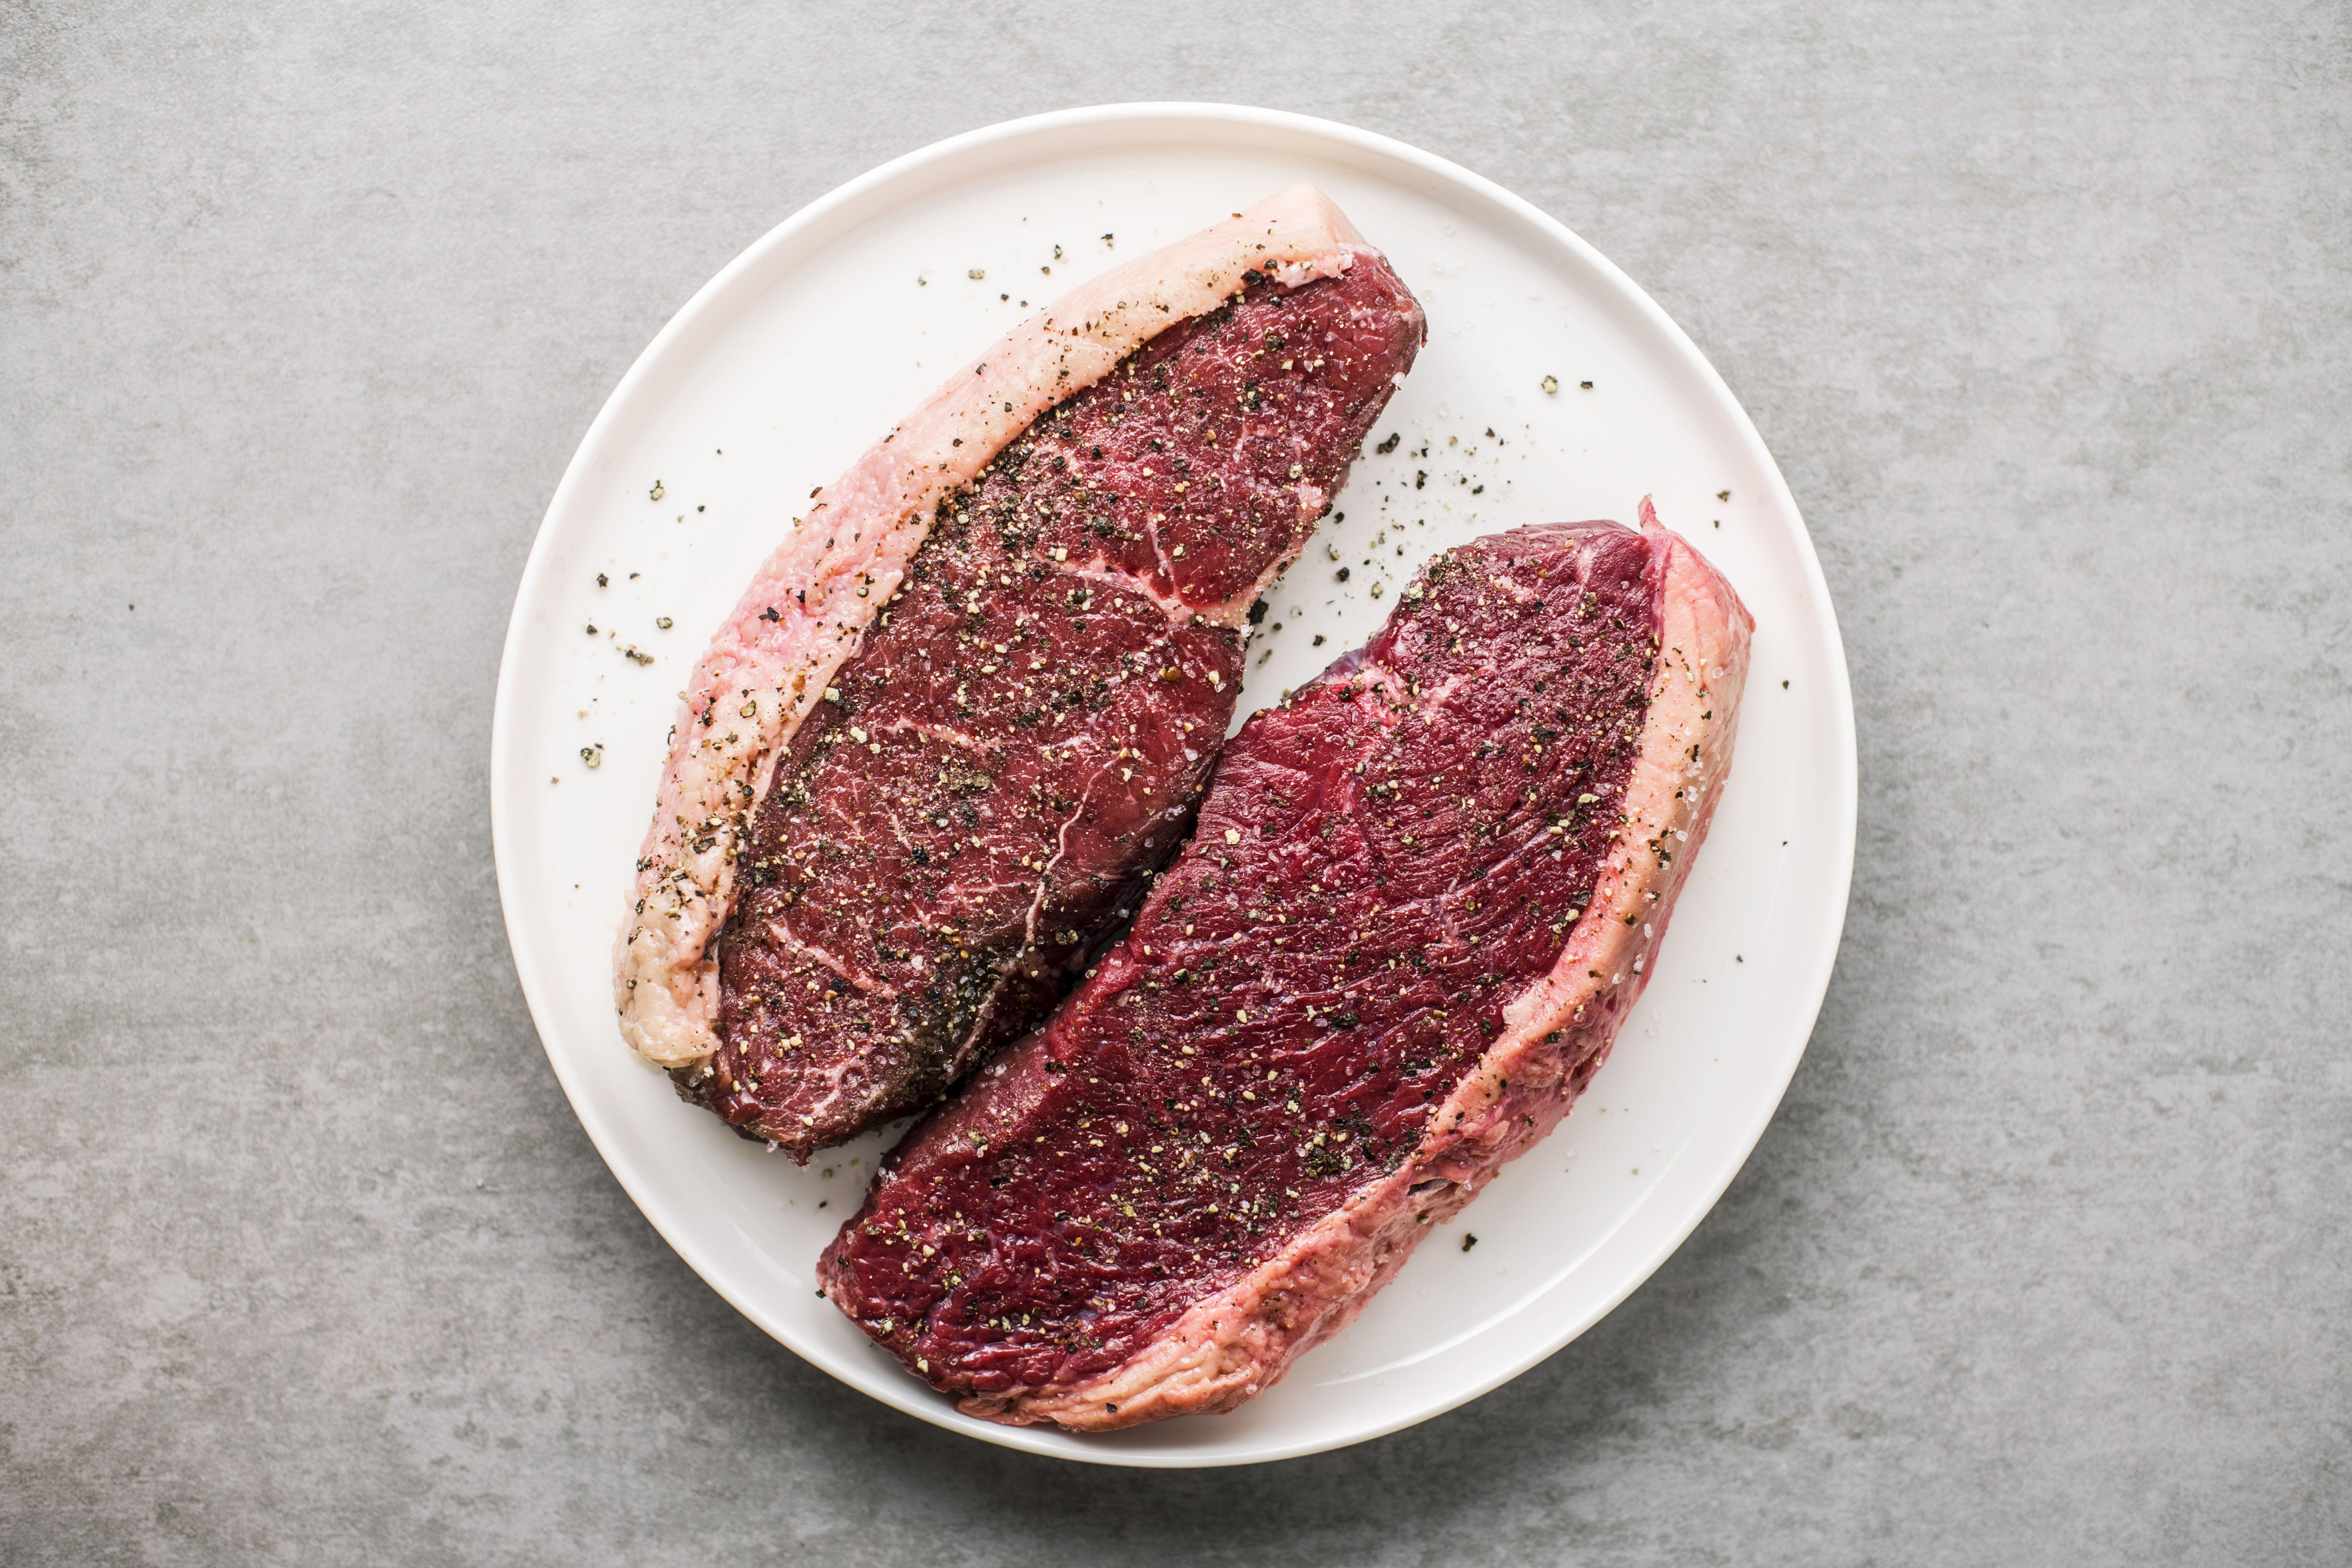 Seasoned steaks on a plate